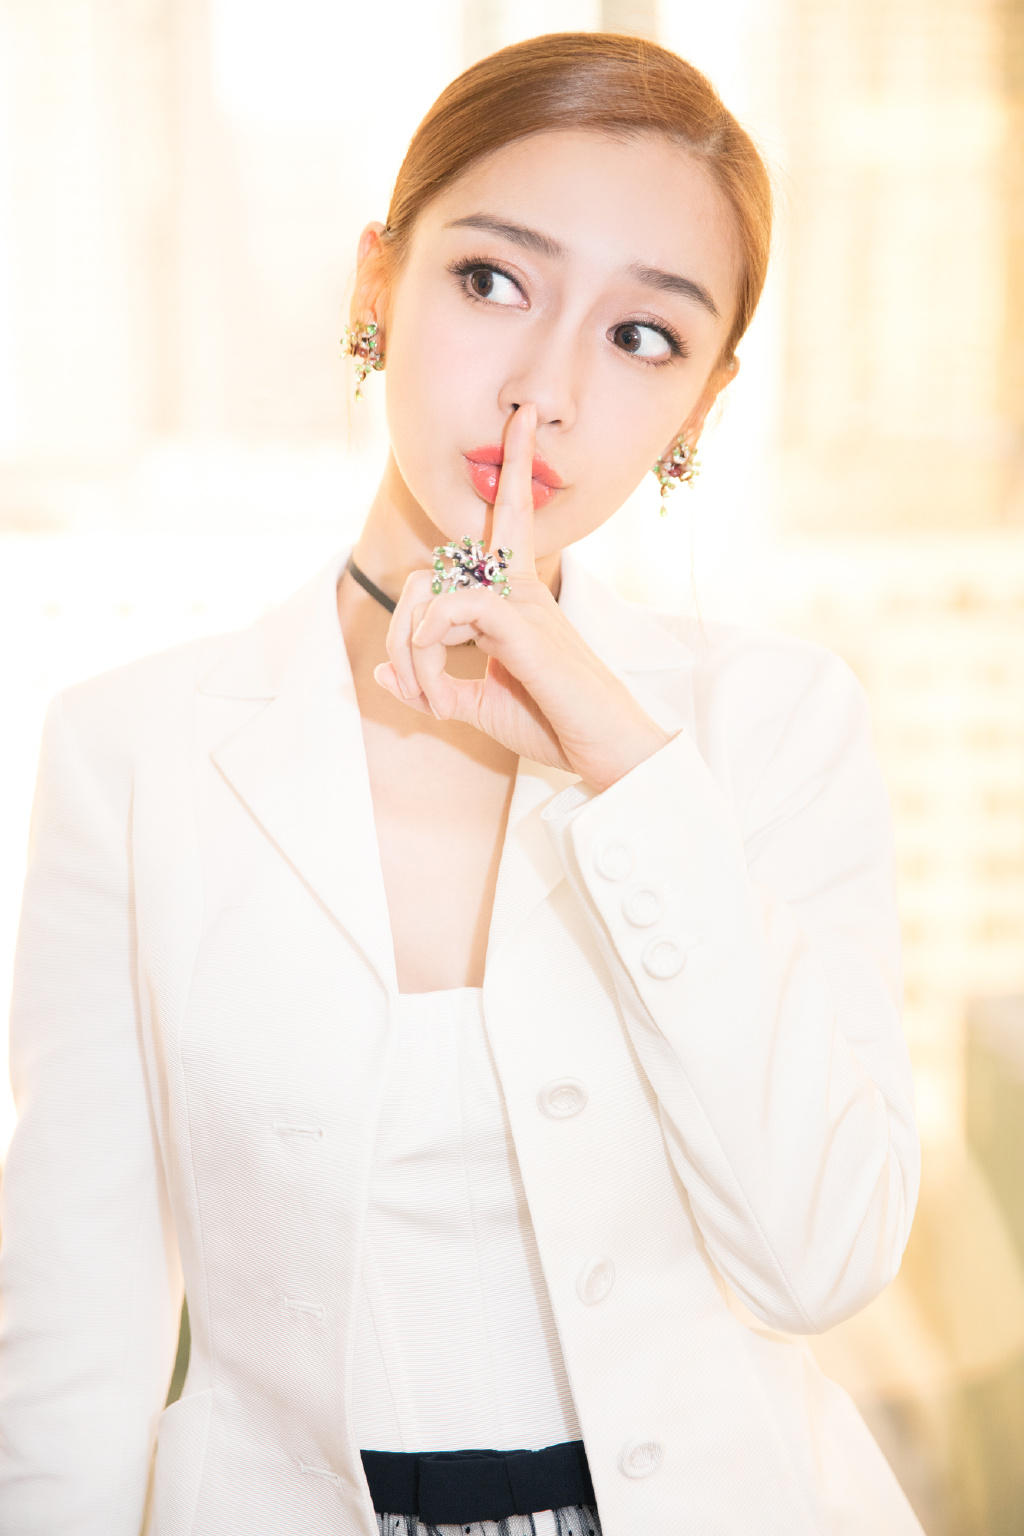 [Angelababy][新闻]171209 优雅大使已就位 An